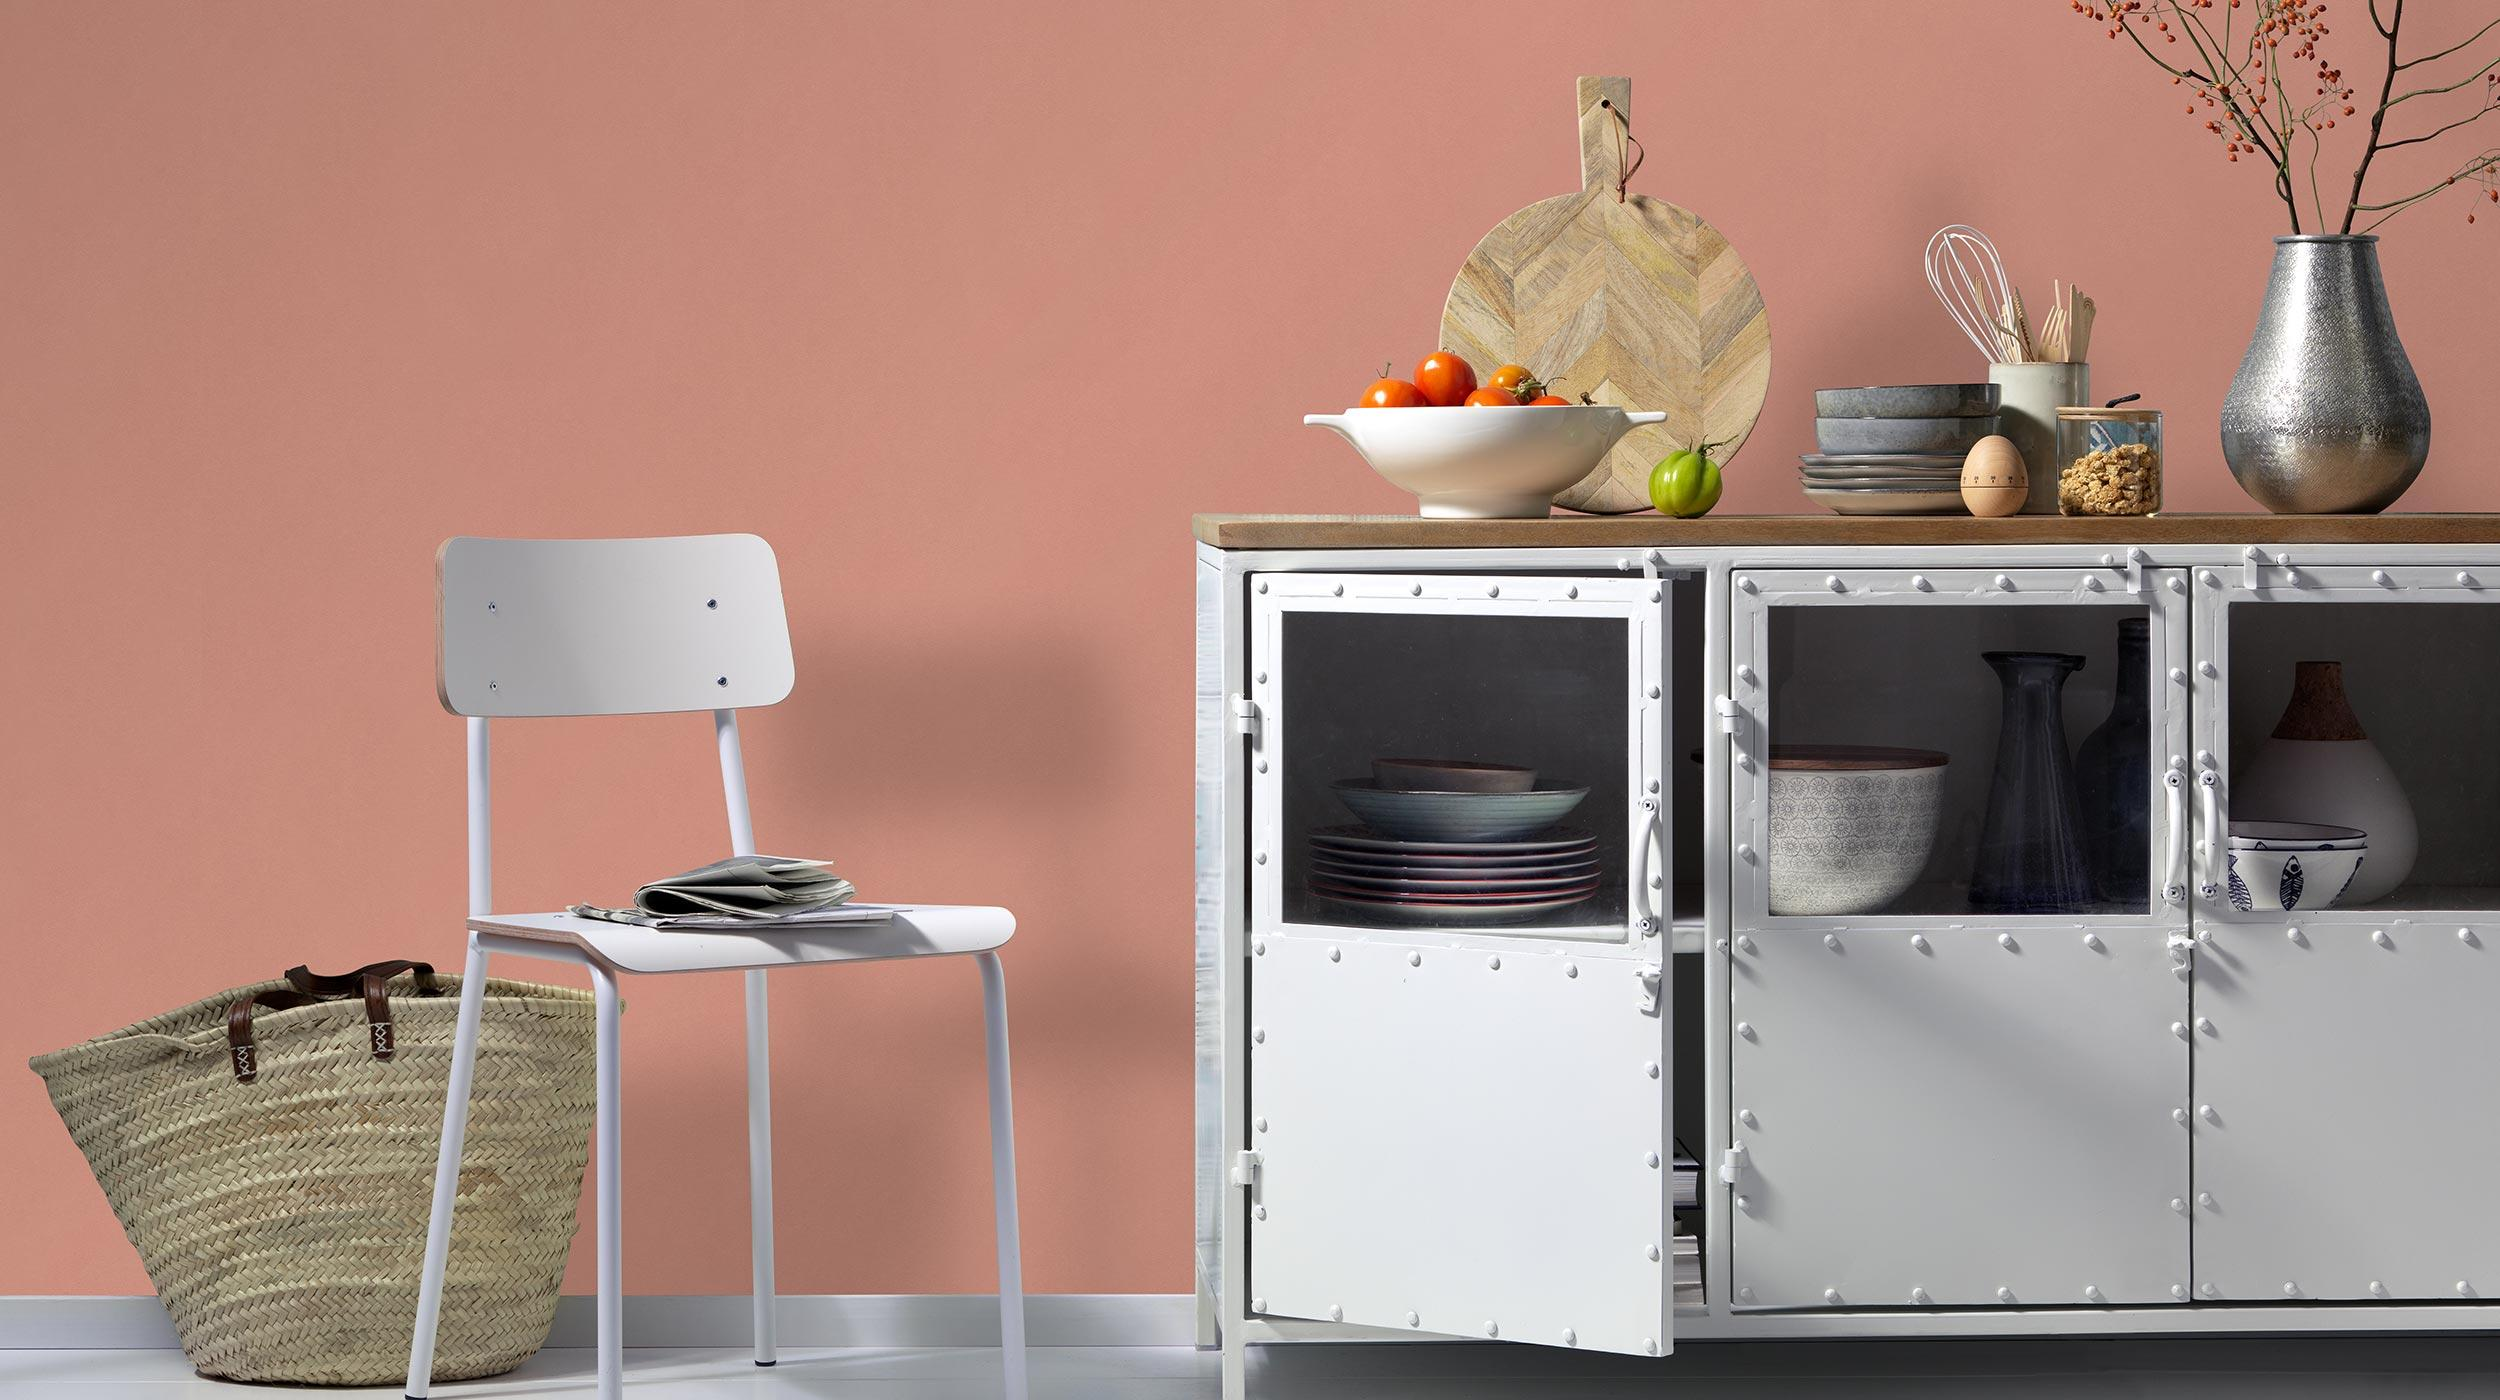 Vliestapete Unistruktur Kollektion Colour Stories in Wohnküche